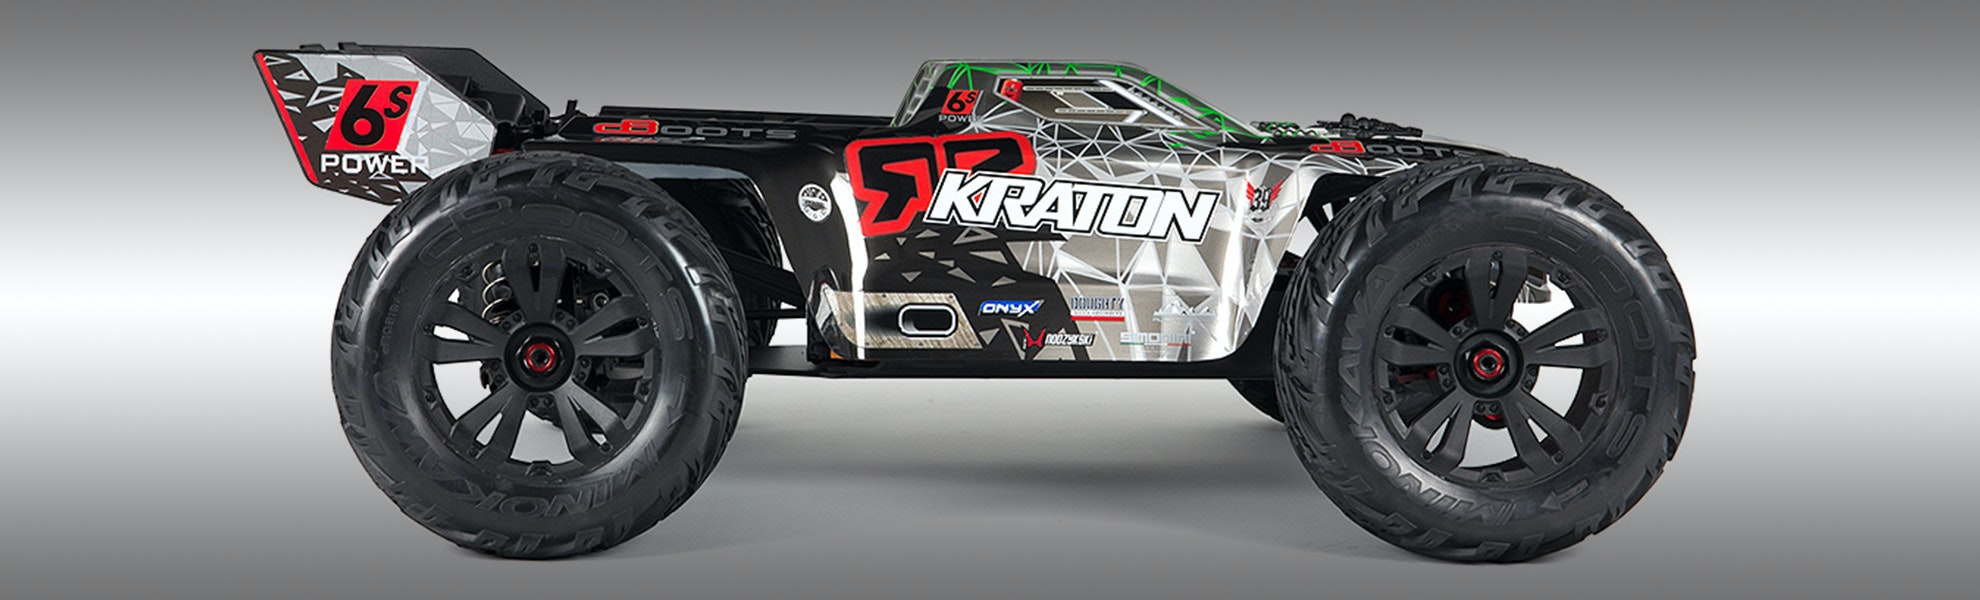 Arrma Kraton BLX 6S V2 RTR